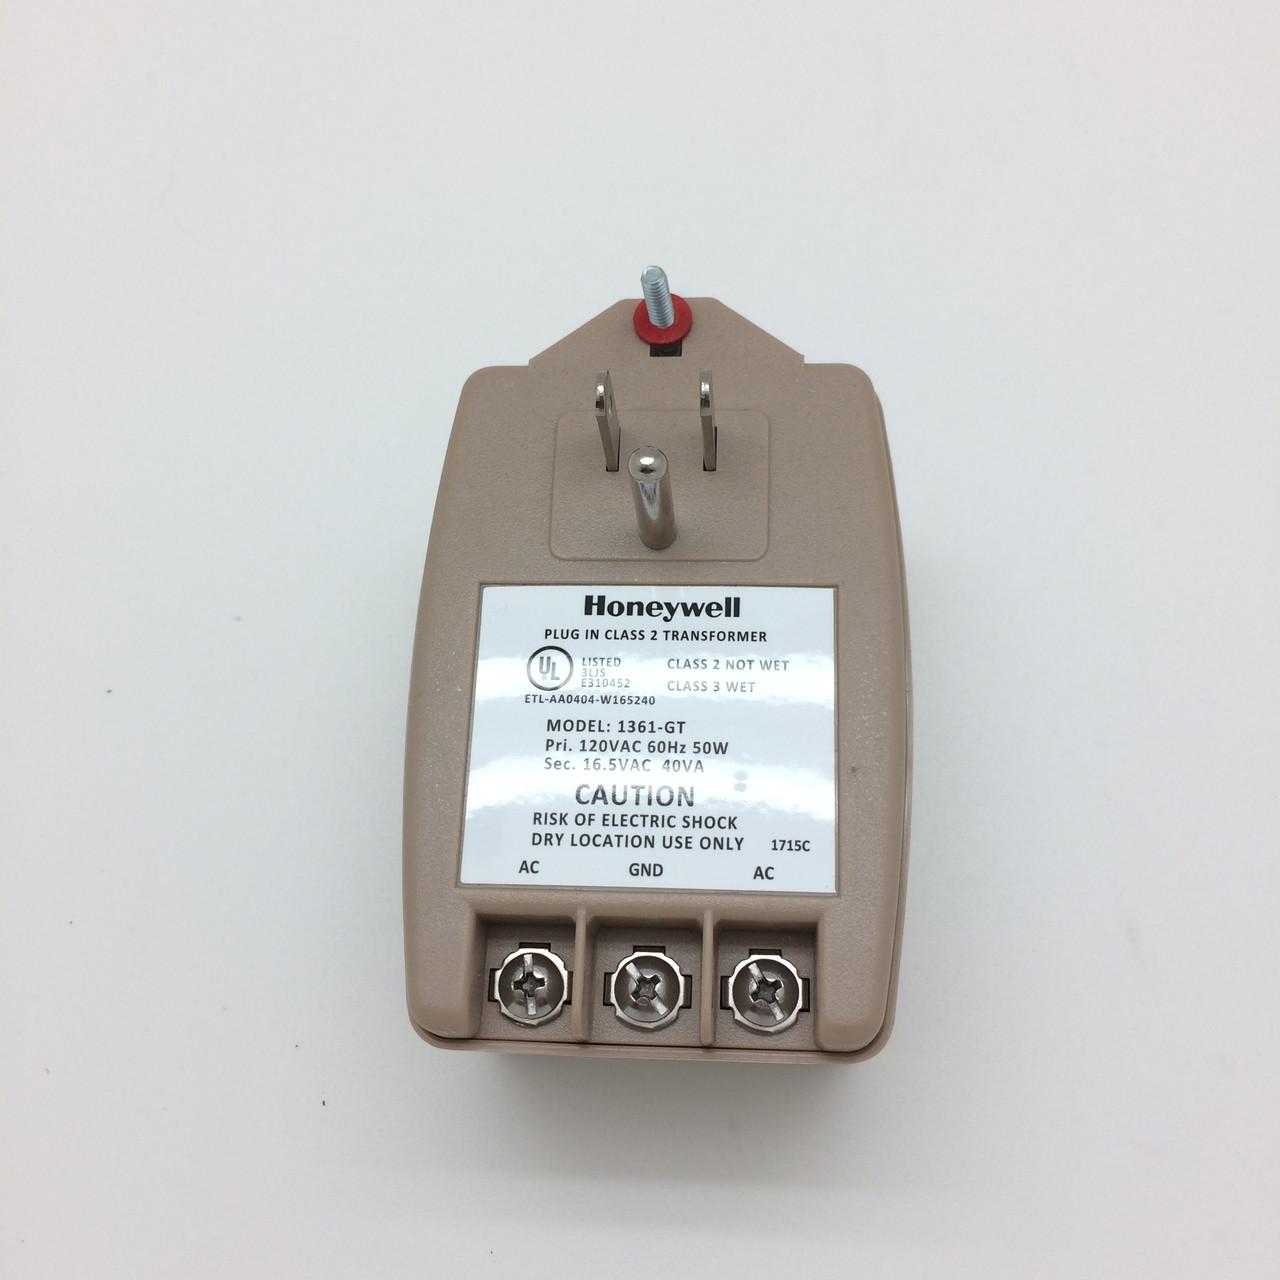 honeywell ademco 1361 gt transformer 16 5v 40va vista 20p control automation gt home a v distribution gt new house wiring [ 1280 x 1280 Pixel ]